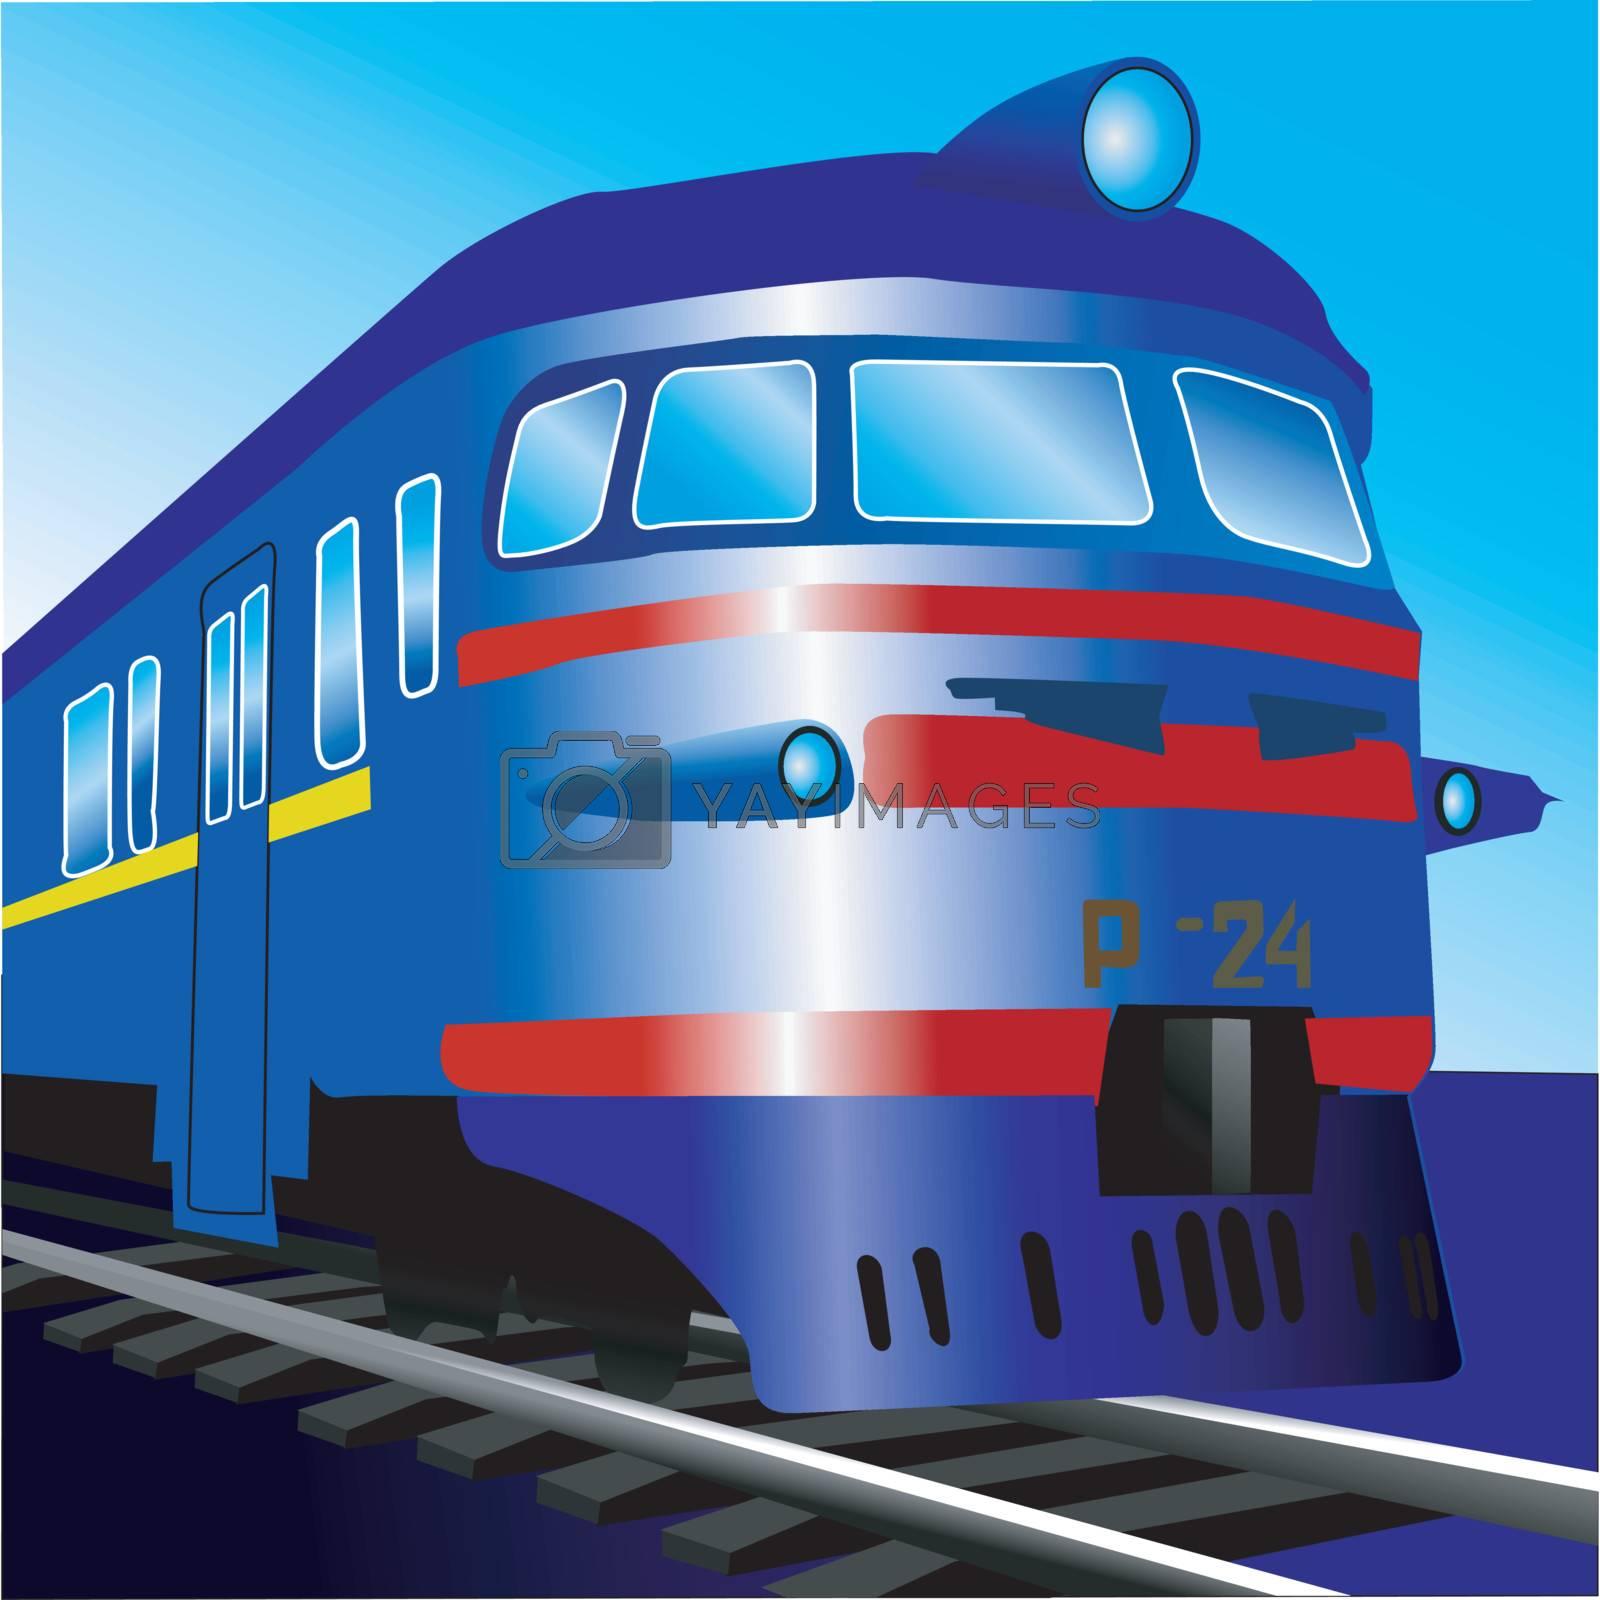 Illustration of vintage electric train on rails